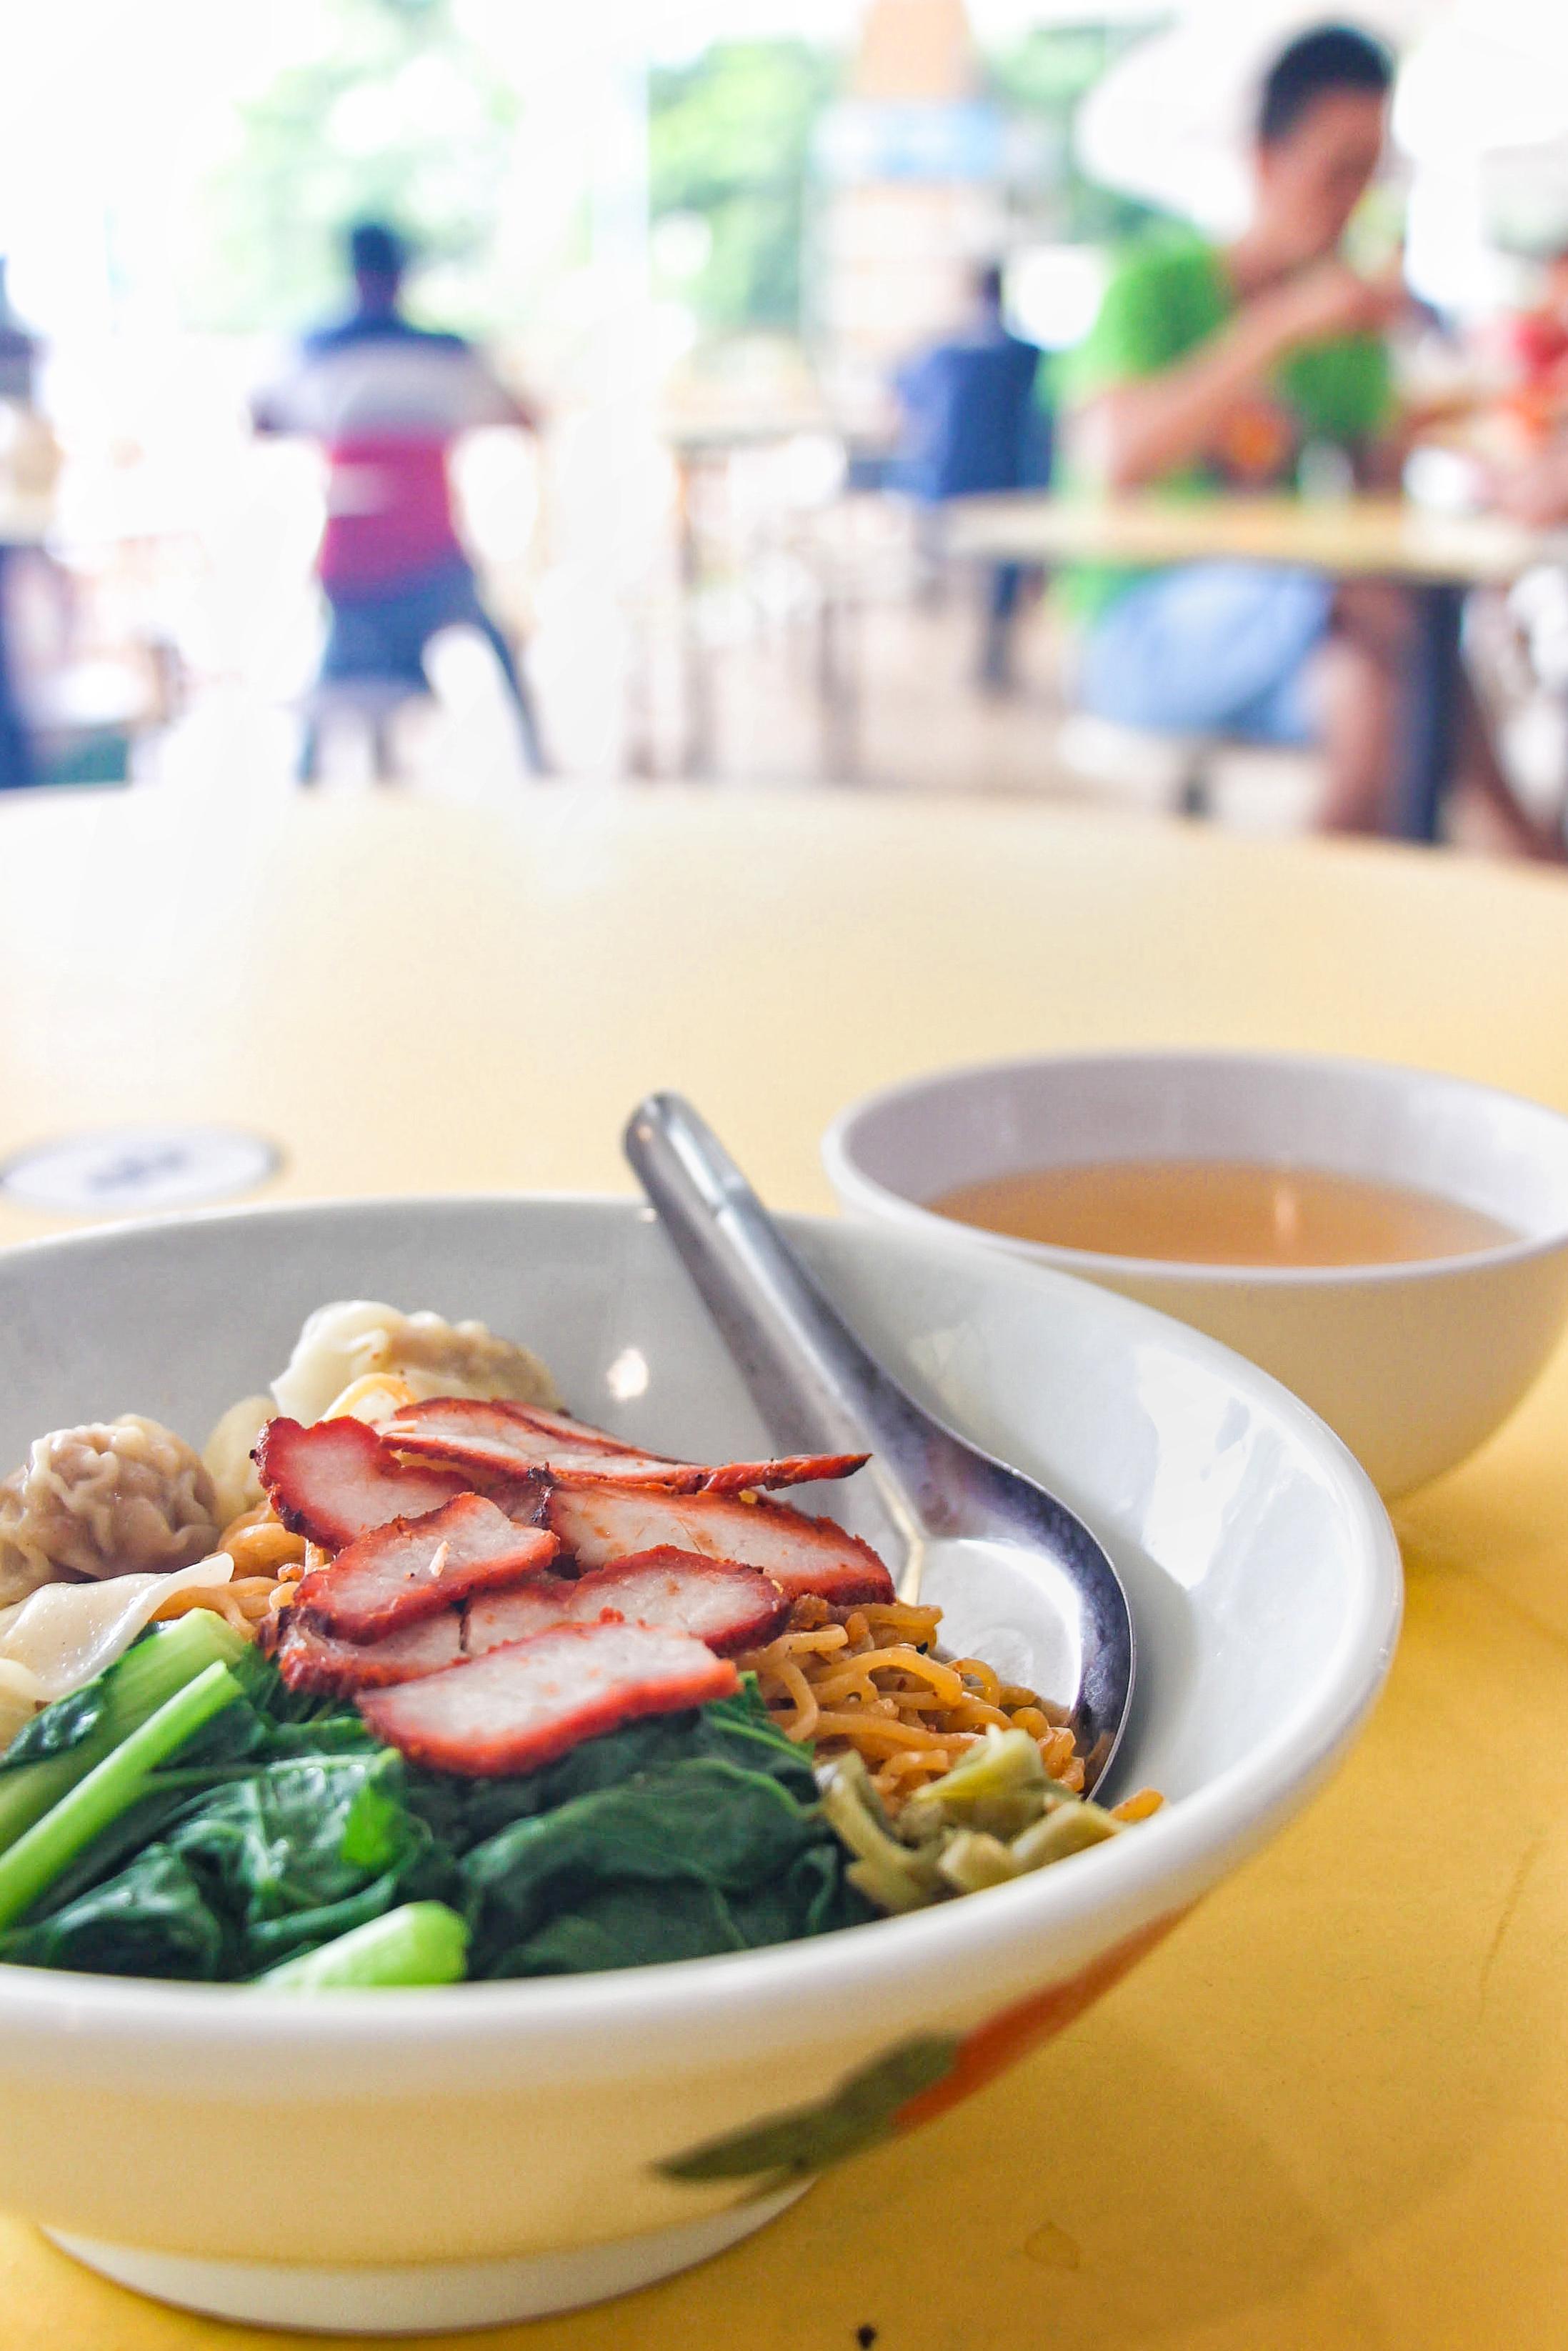 A Cho Kee Noodle dish: Wonton Mee noodles with bok choy, wonton dumplings, char siu pork shavings and a broth side.